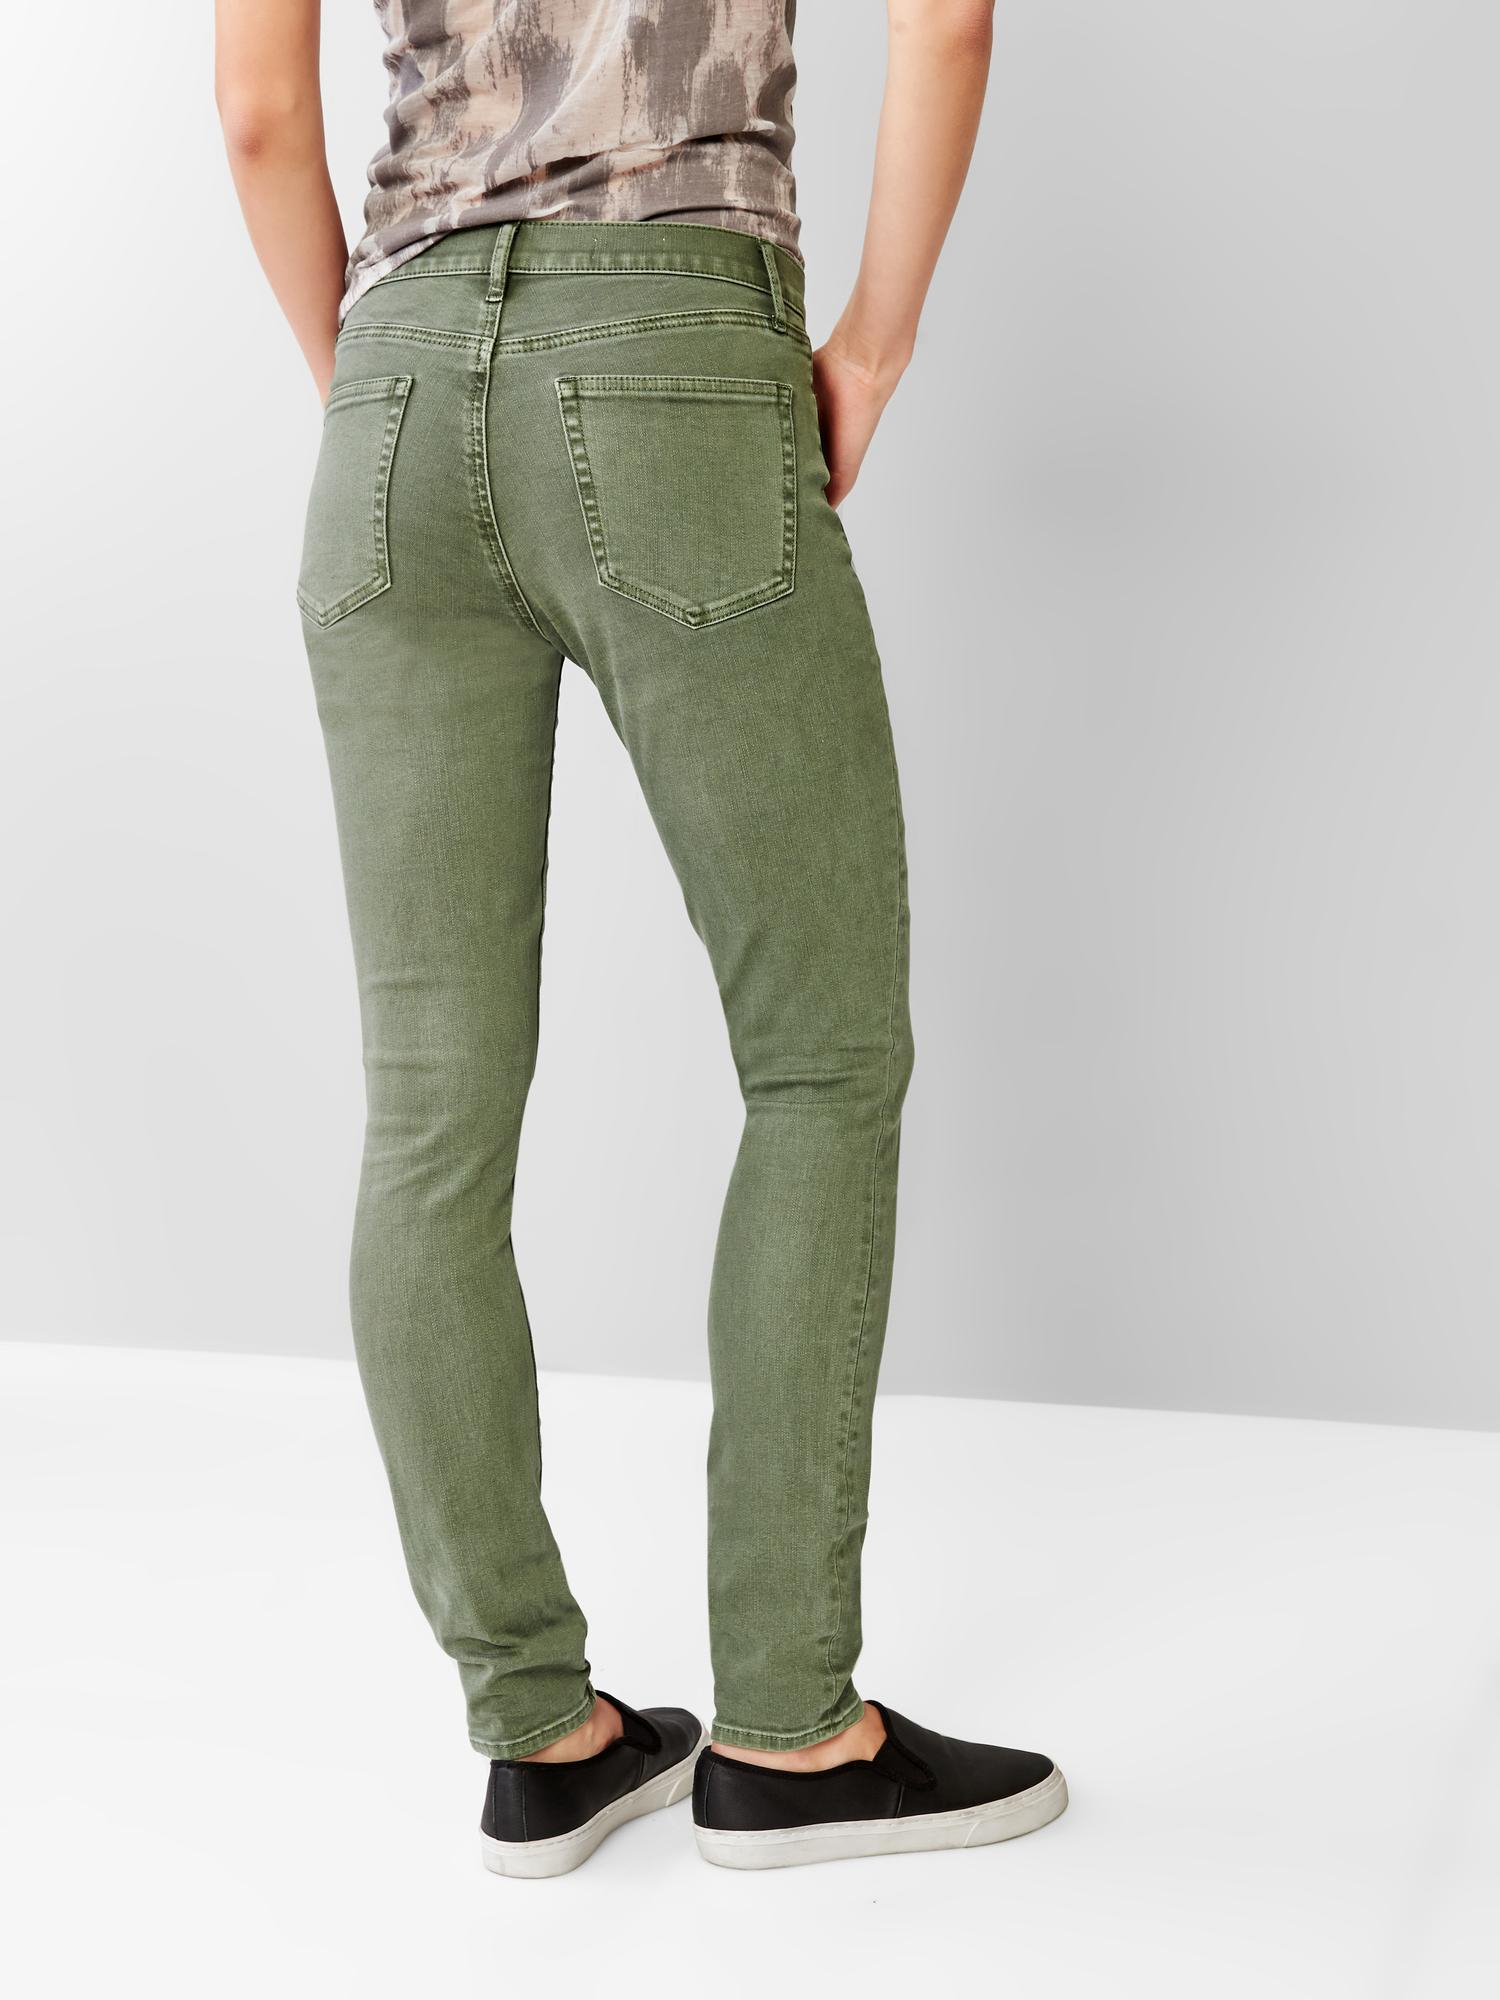 Gap 1969 Resolution True Skinny Jeans in Green vintage palm  Lyst